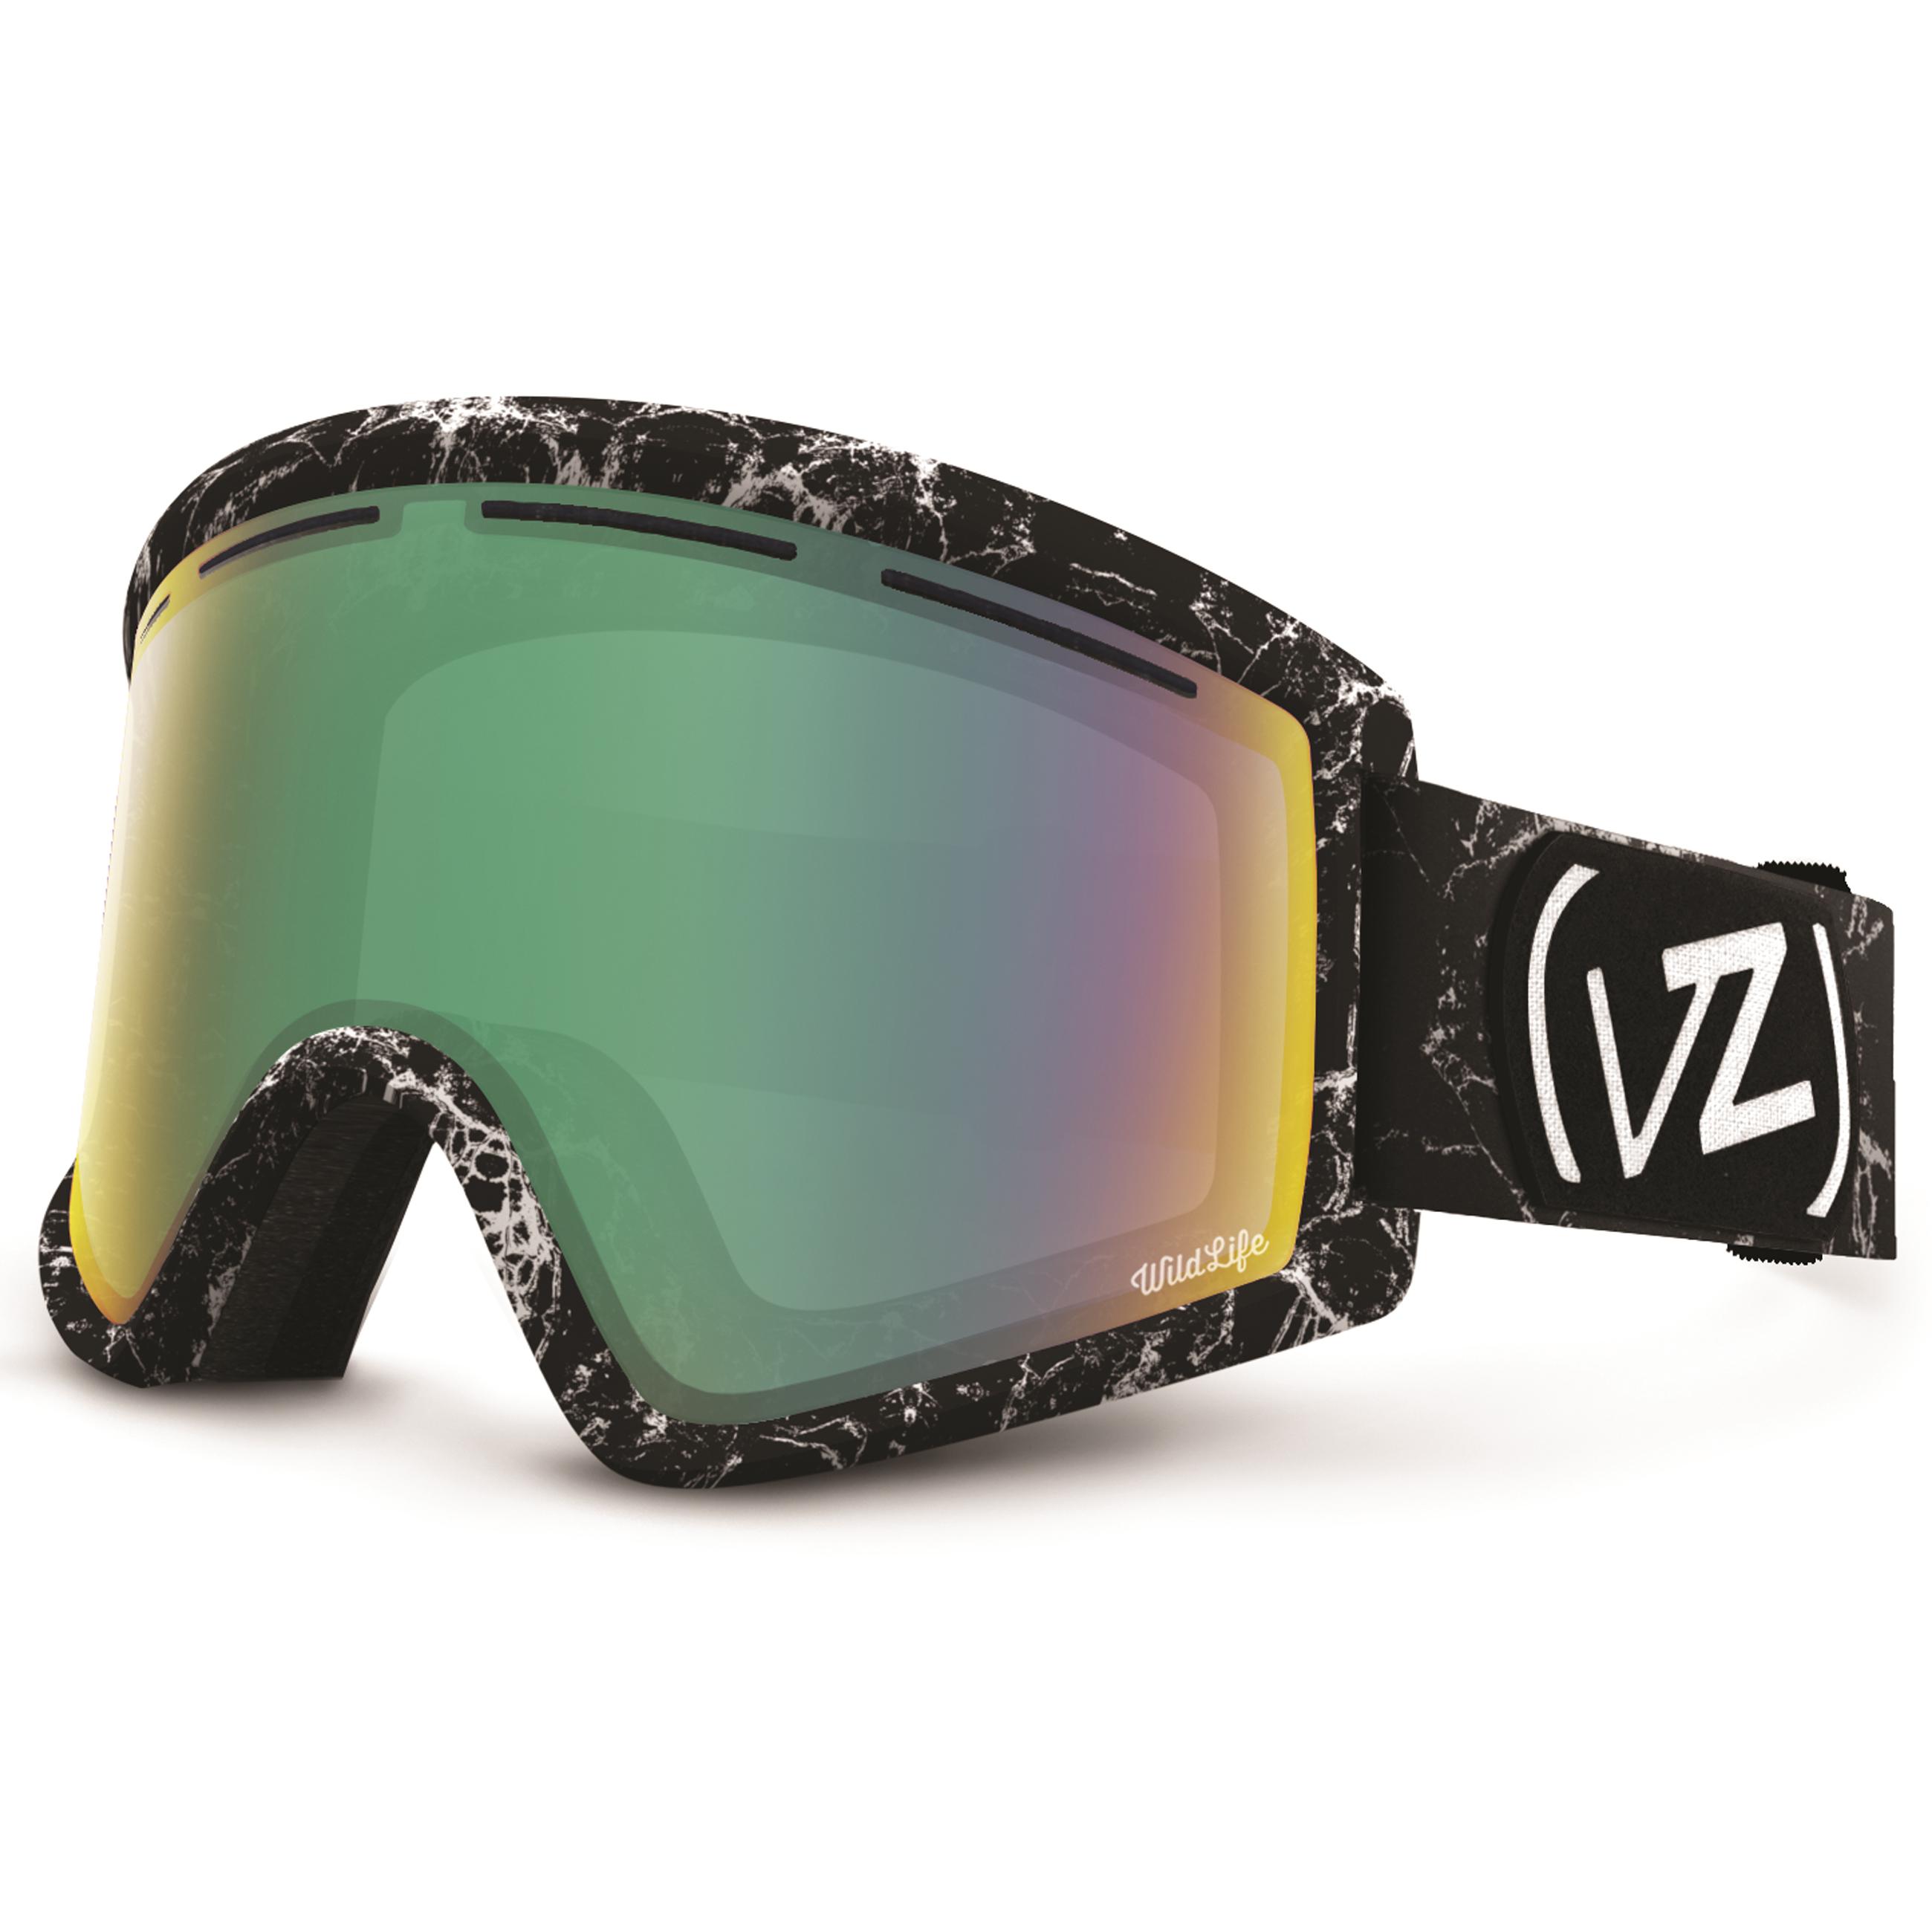 Details about Von Zipper Cleaver I-type Snow Goggles Halldor Helgason  Marble Wildlife FreeLens